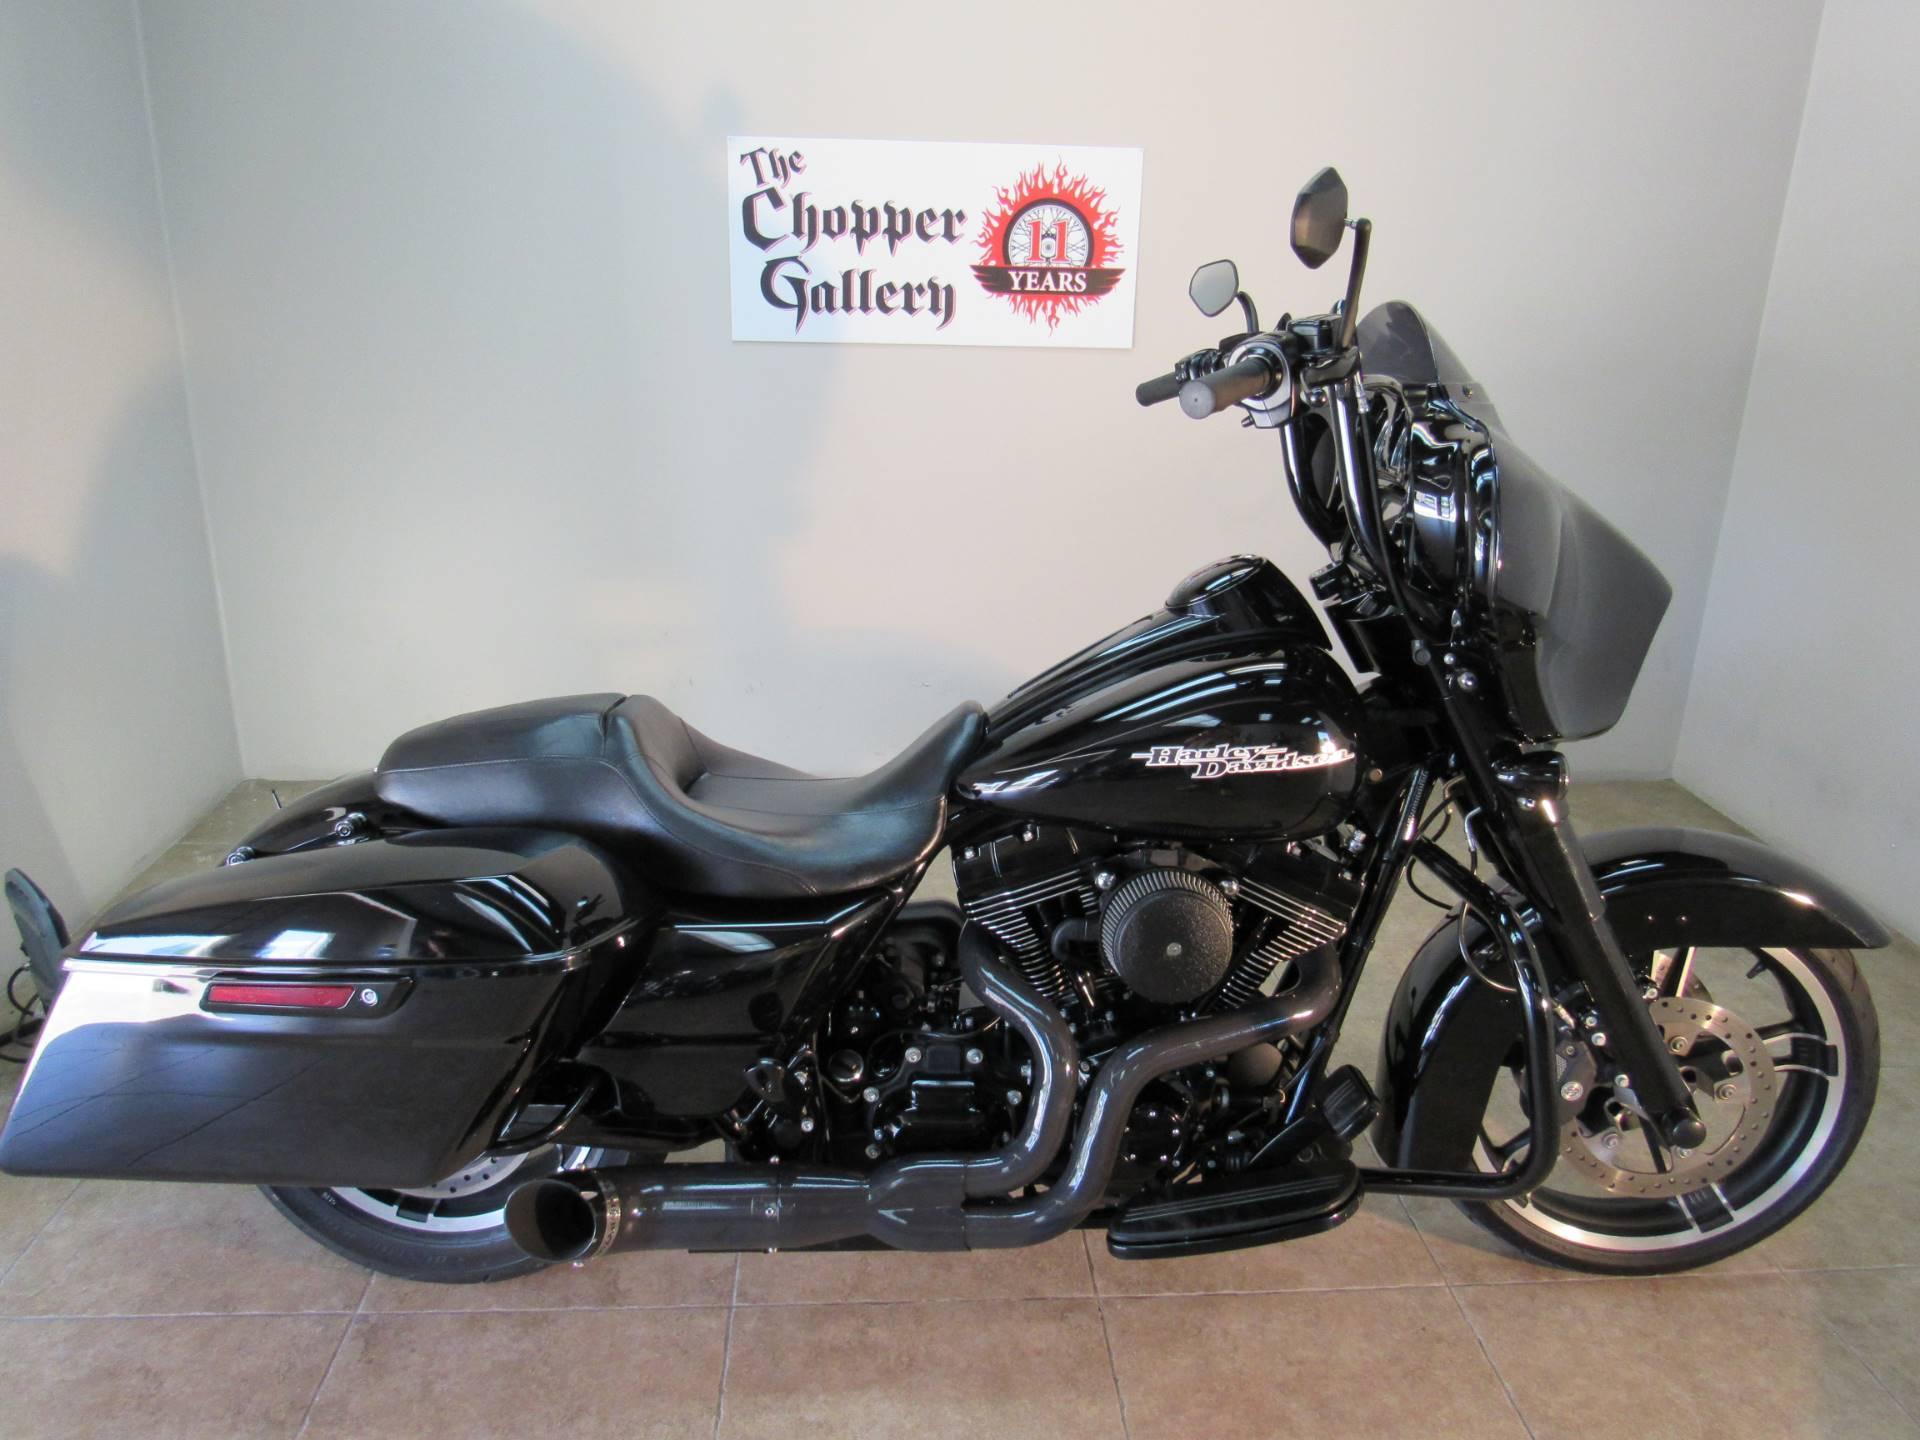 2016 Harley Davidson Street Glide In Temecula California Photo 4